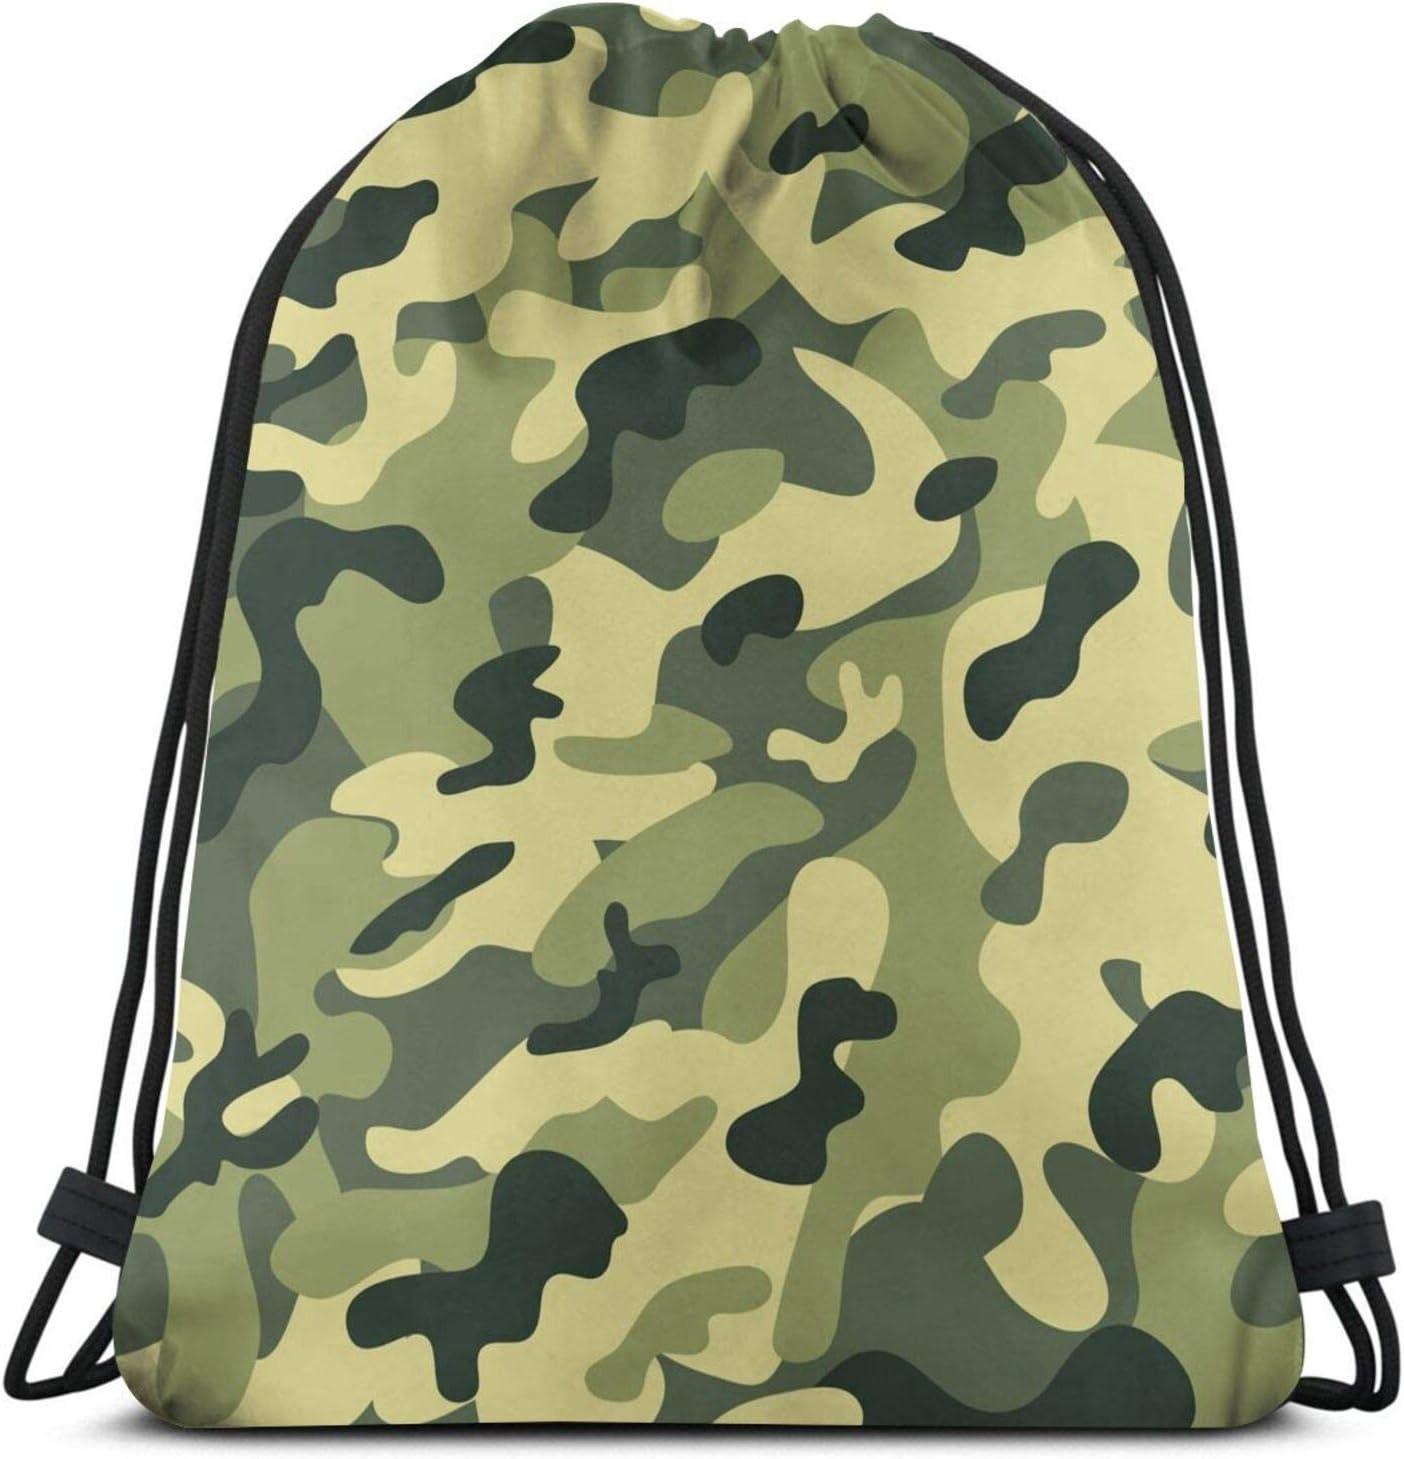 Camo Drawstring Bag Camouflage Gym Bag Sports Backpack Lightweight Waterproof Bag for Men Women Outdoor Gym Sport